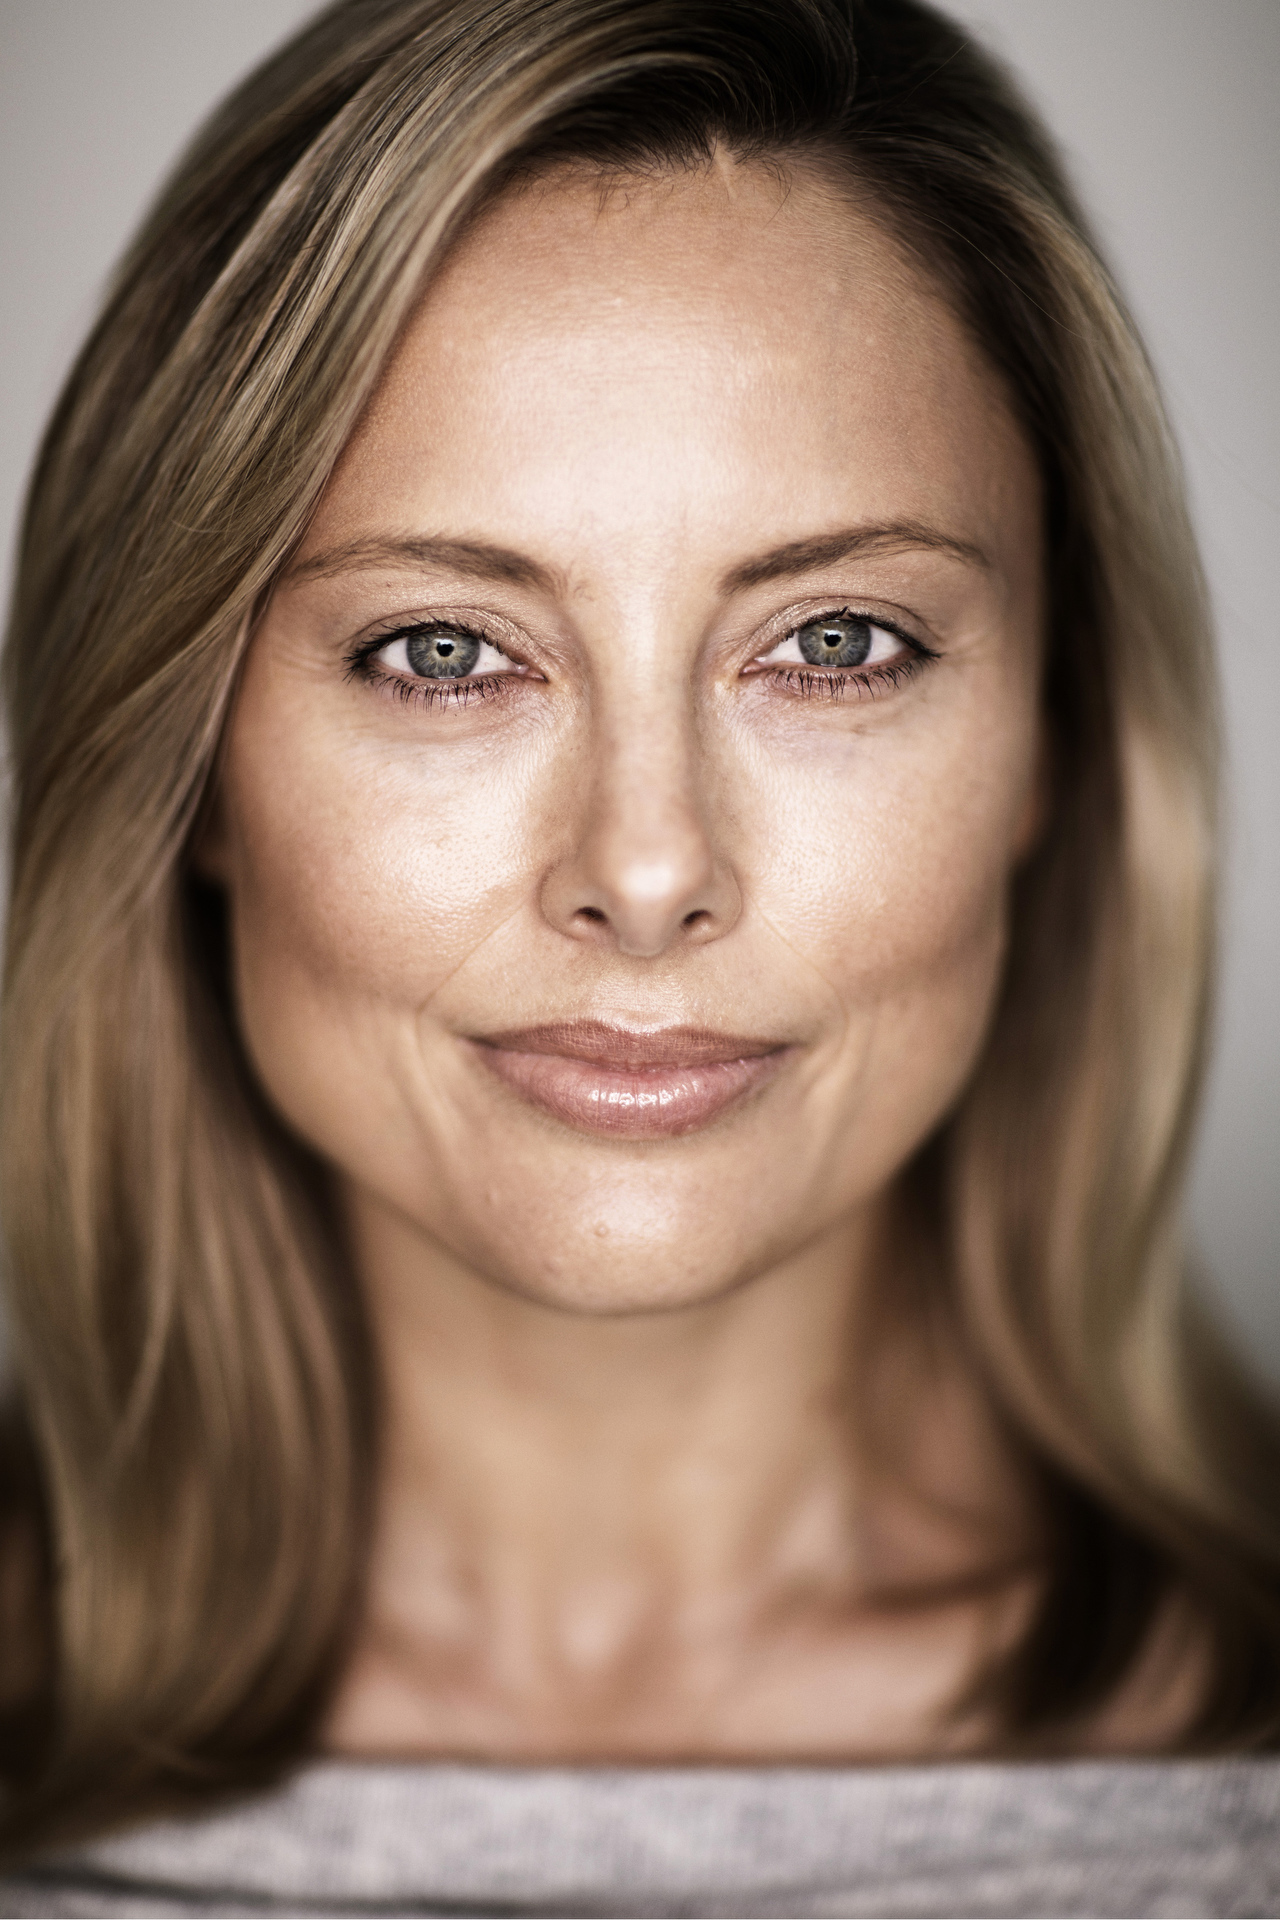 Sydney portrait photographer, personal branding, Eye2Eye, actor, headshots, corporate photography, corporate headshots, portraits, head shots, Allison Langdon, TV presenter, journalist